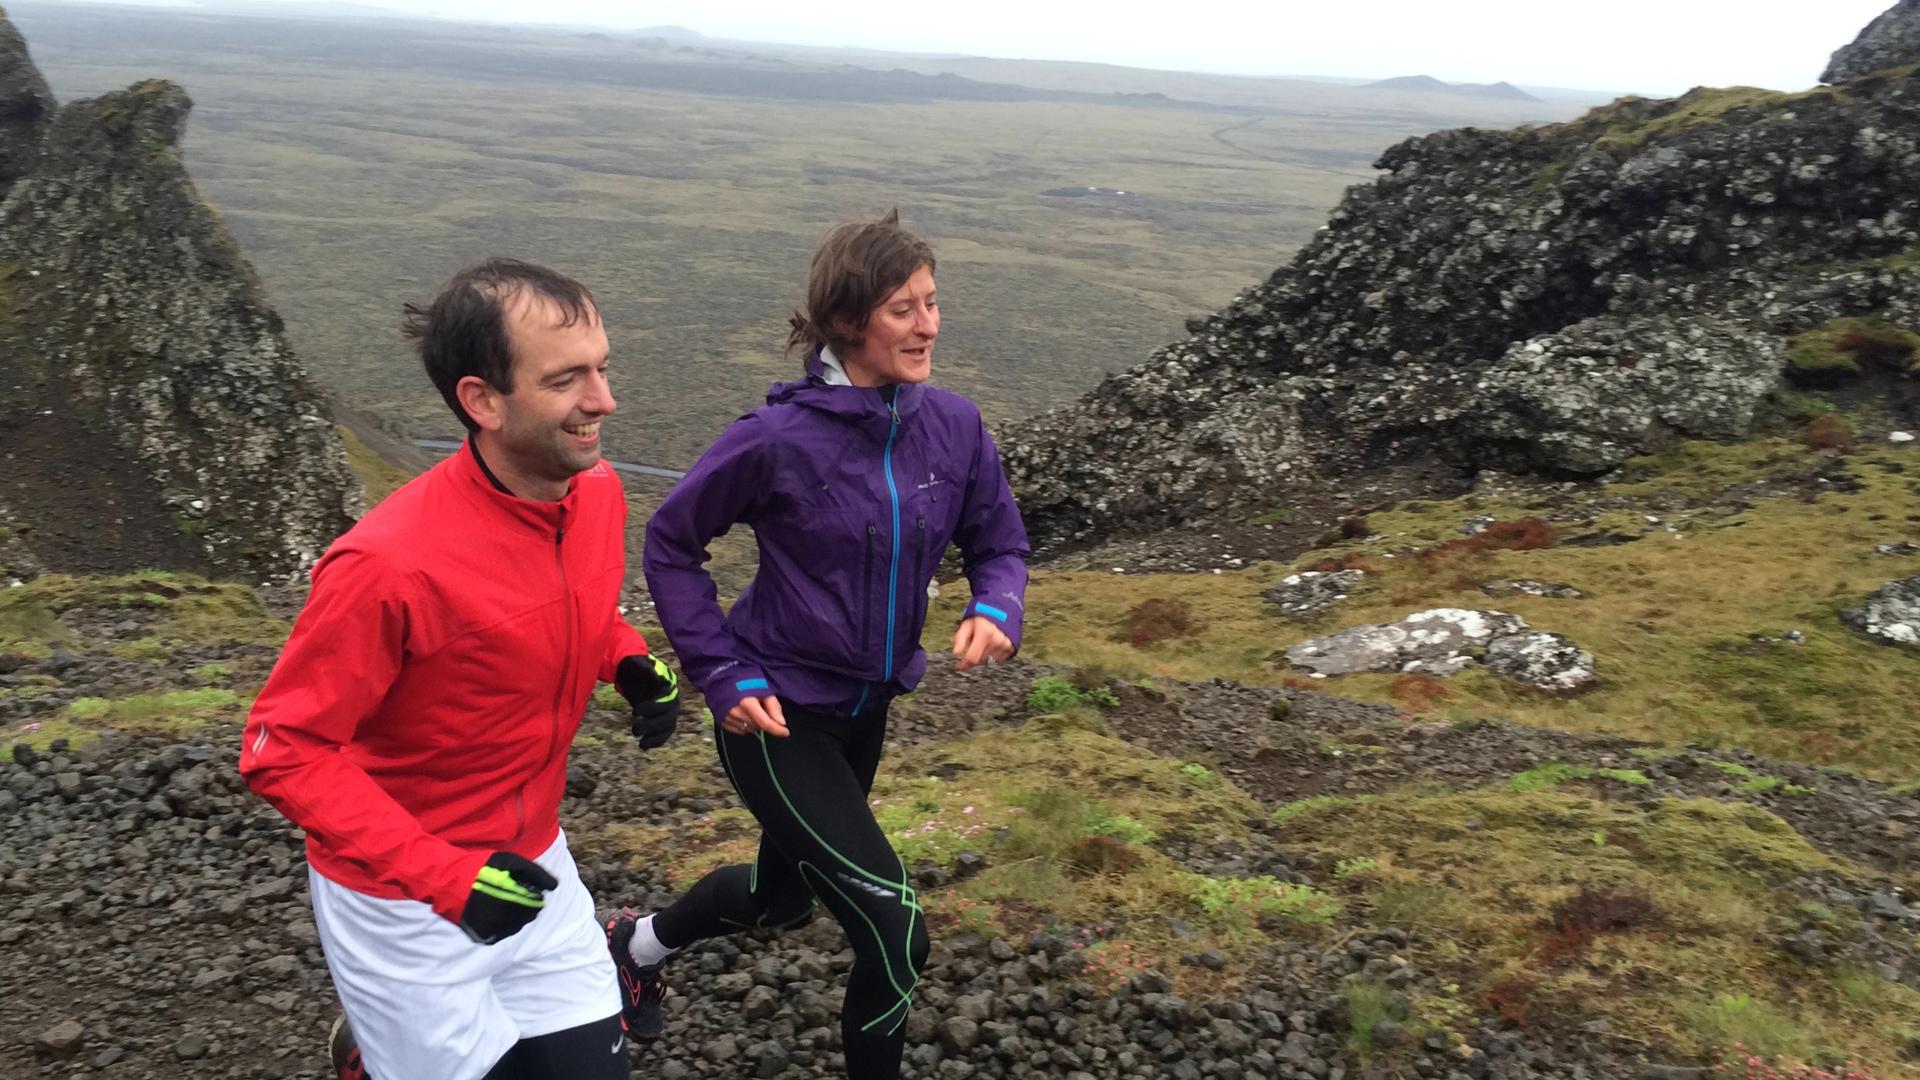 Iceland adventure running retreat   Absolutely worth it!